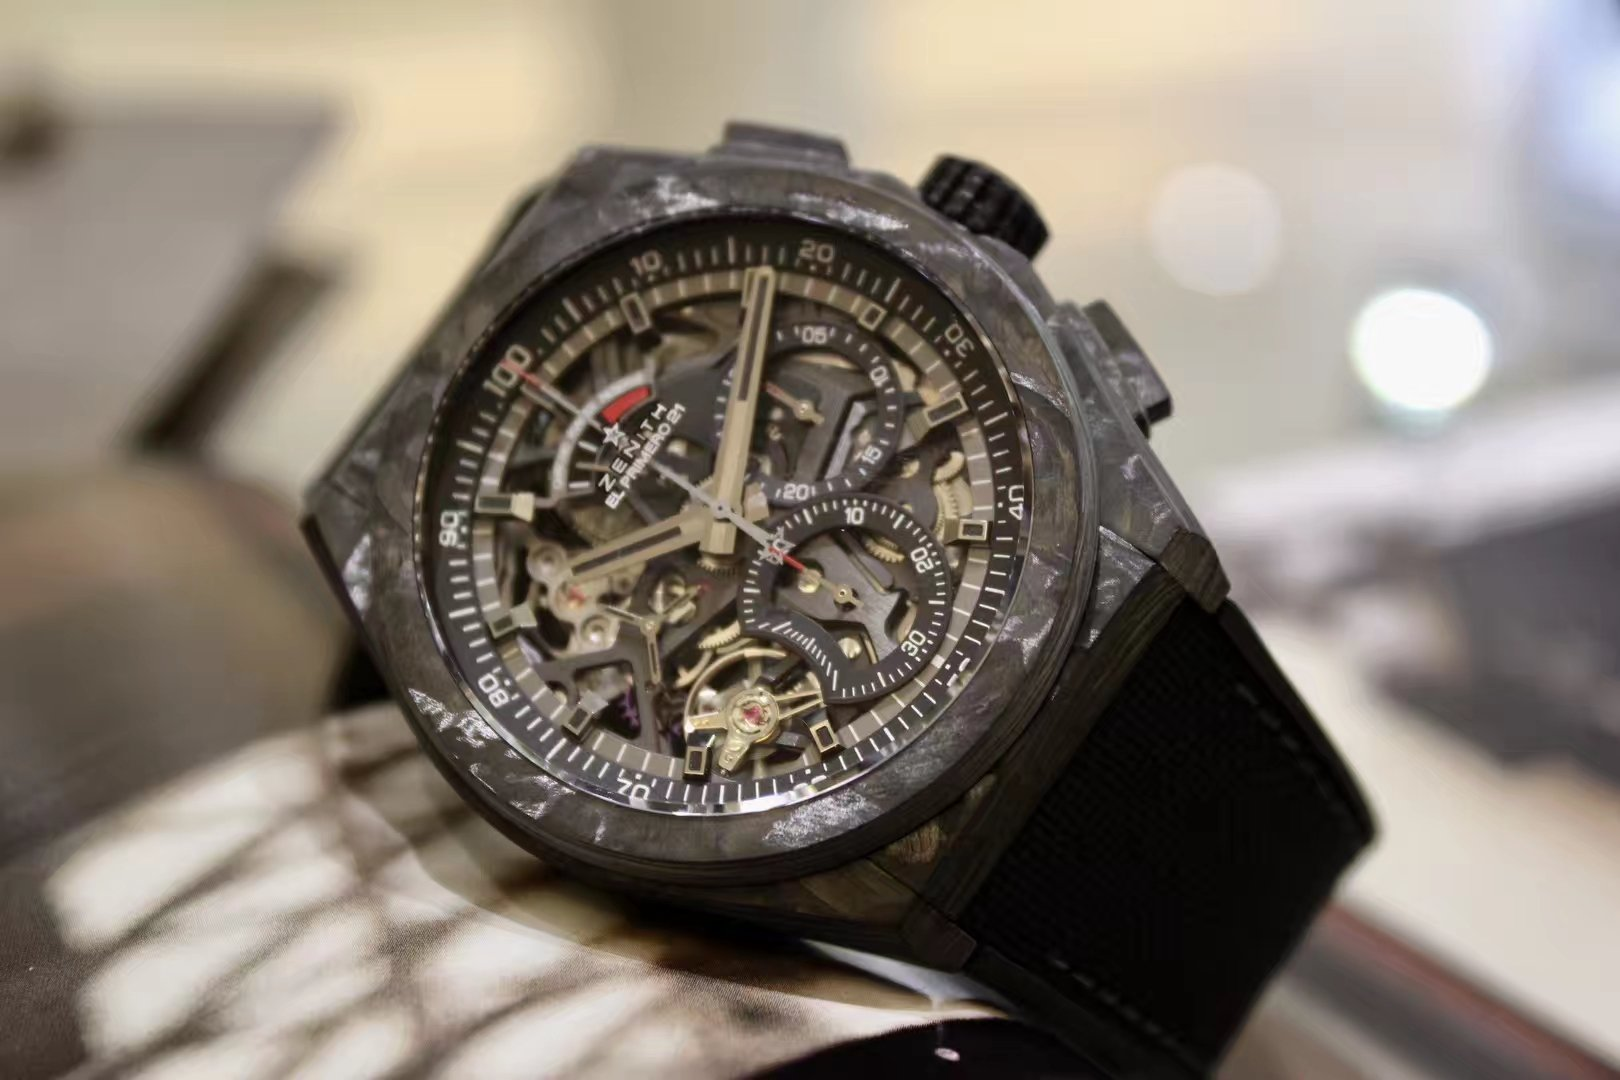 ZENITH真力时DEFY El Primero 21 系列镂空计时腕表,黑碳纤维材质10.9000.9004/96.R921插图